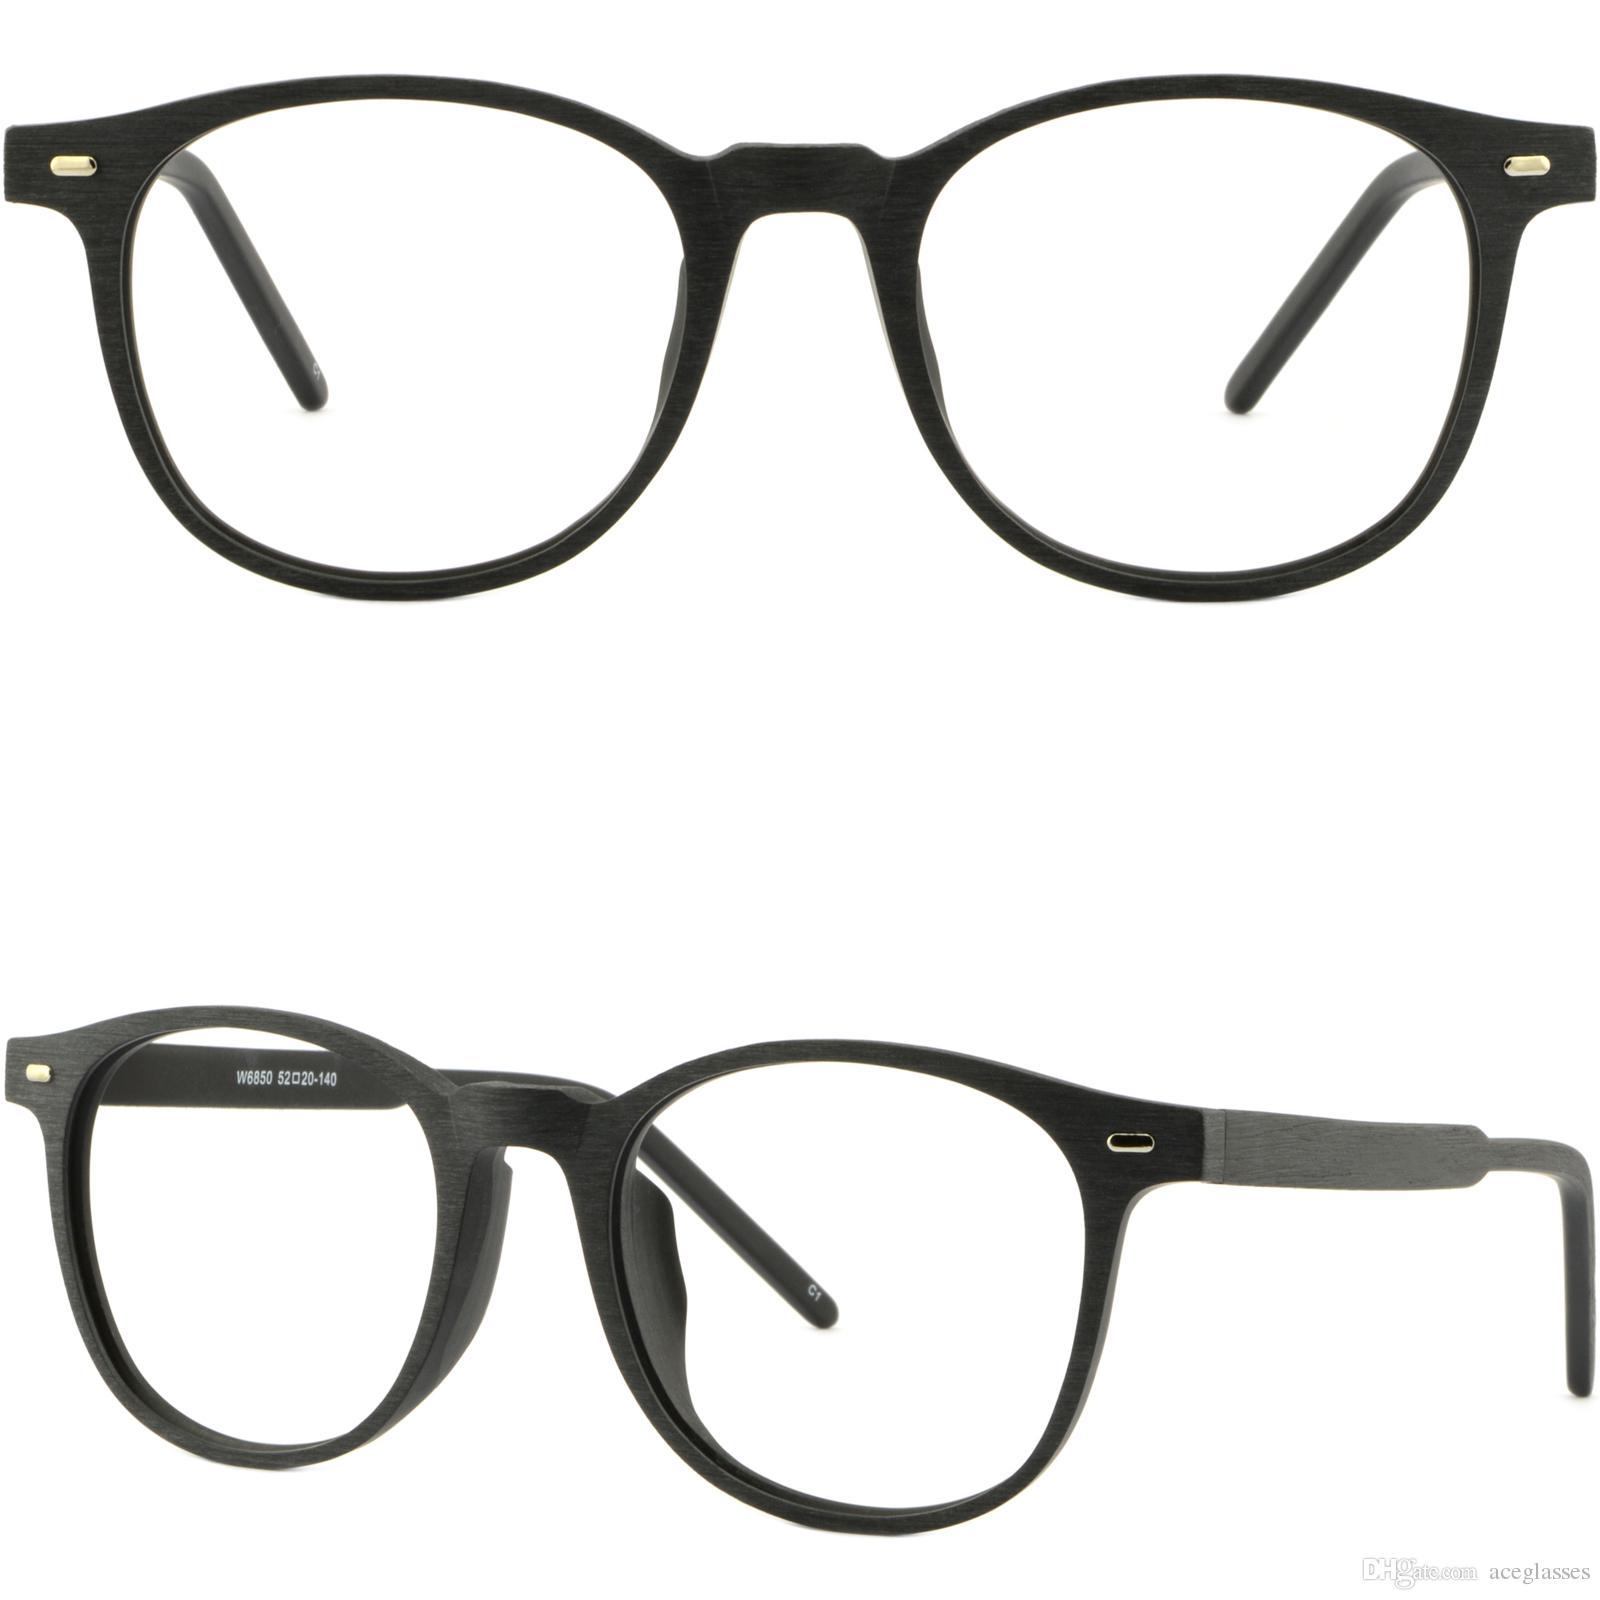 brillengestell fassung gestell brille wide square men womens frames wood acetate prescription glasses sunglasses black mens fashion eyeglass frames - Wide Eyeglass Frames